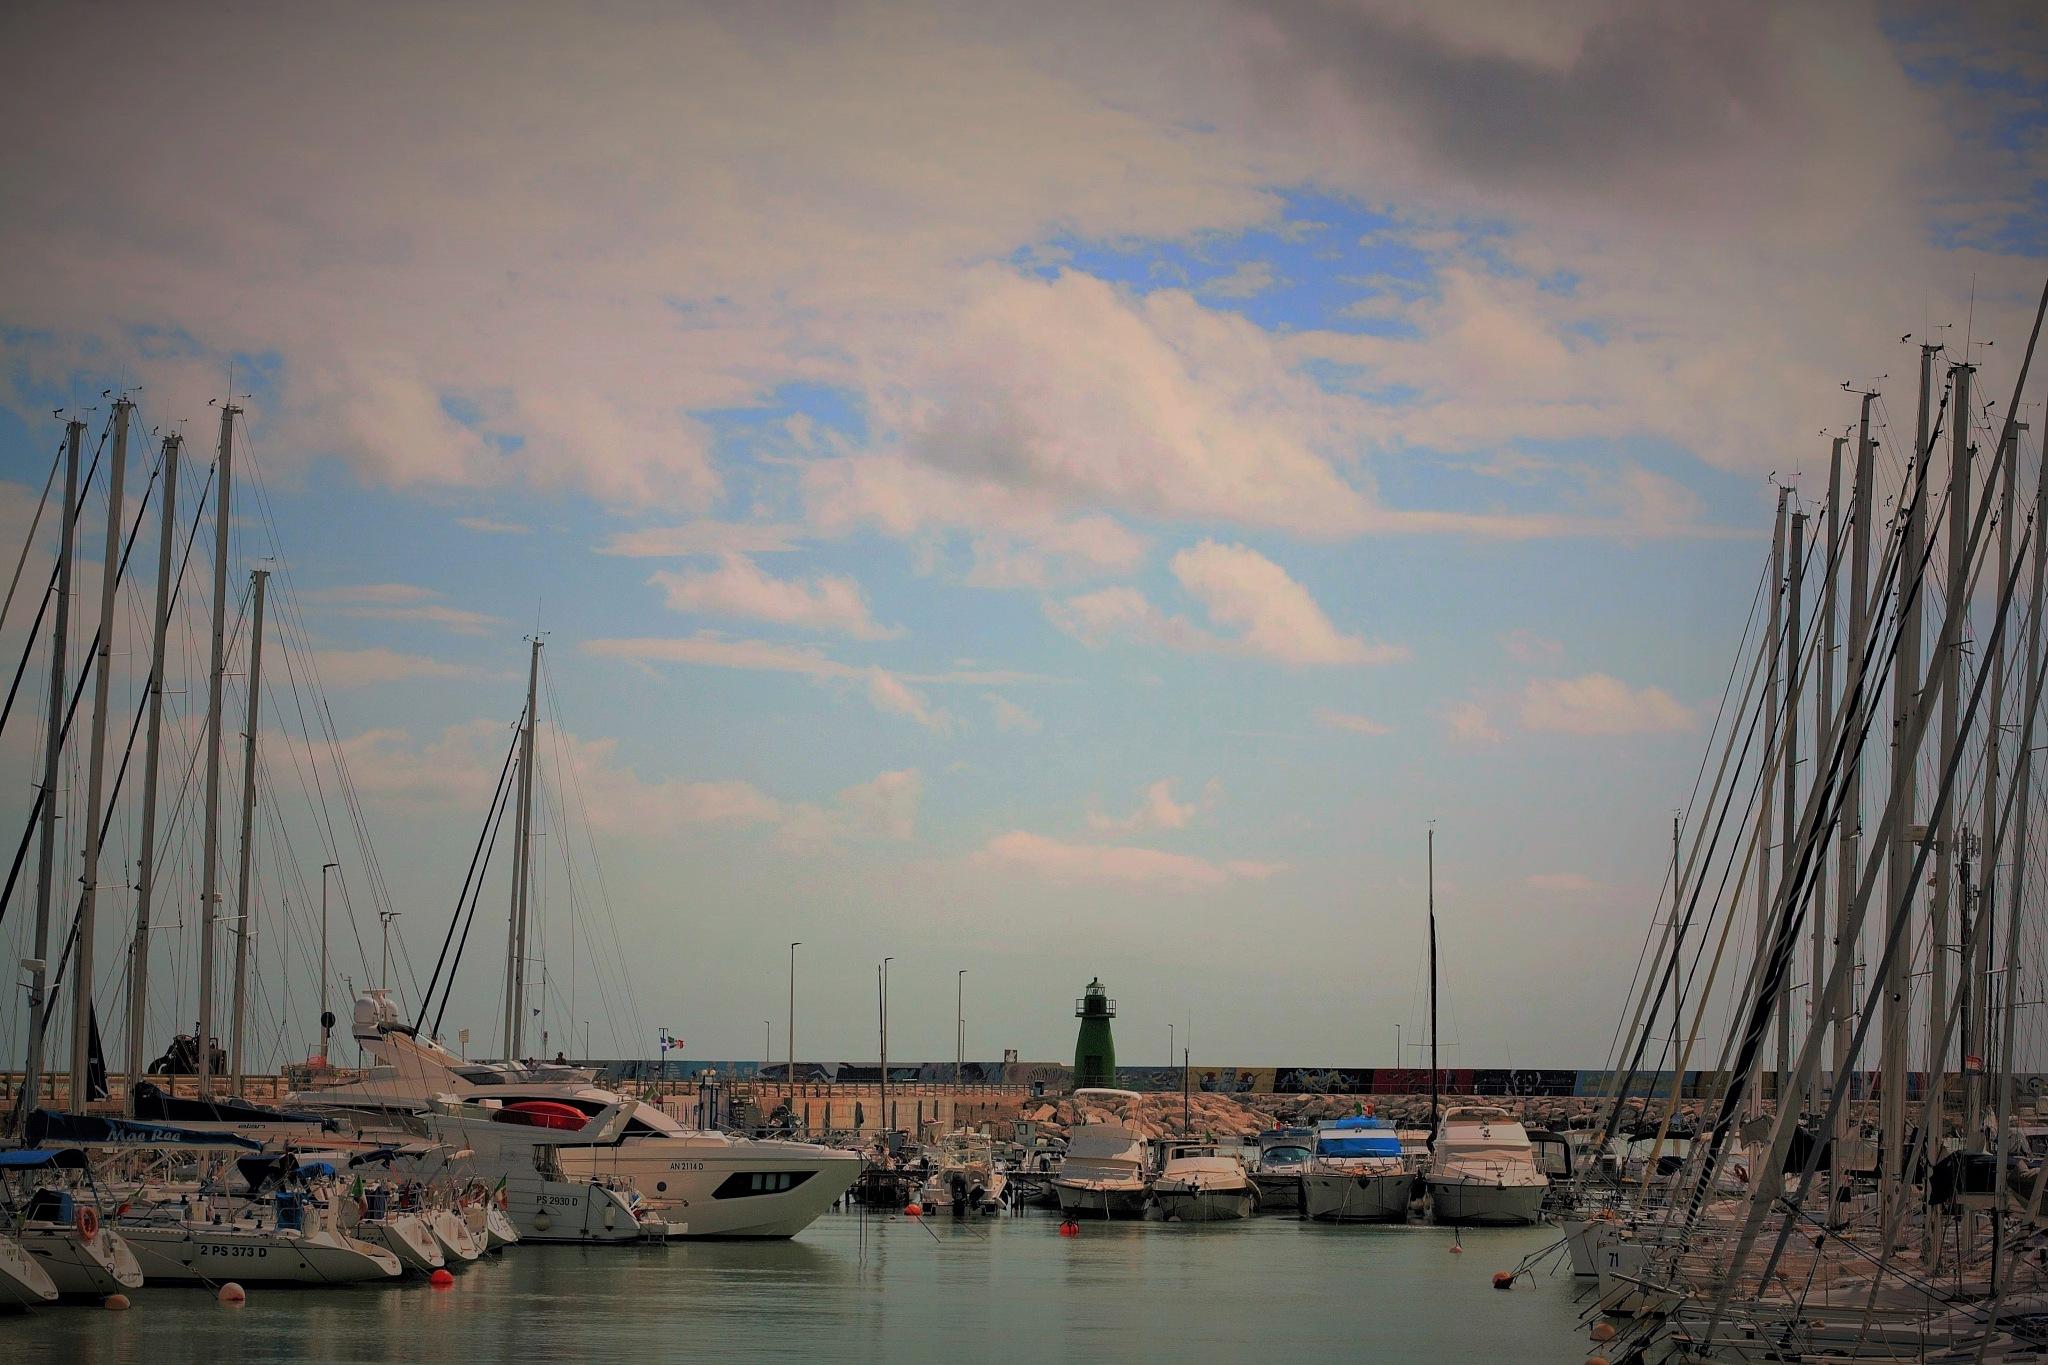 The marina by Ghislain